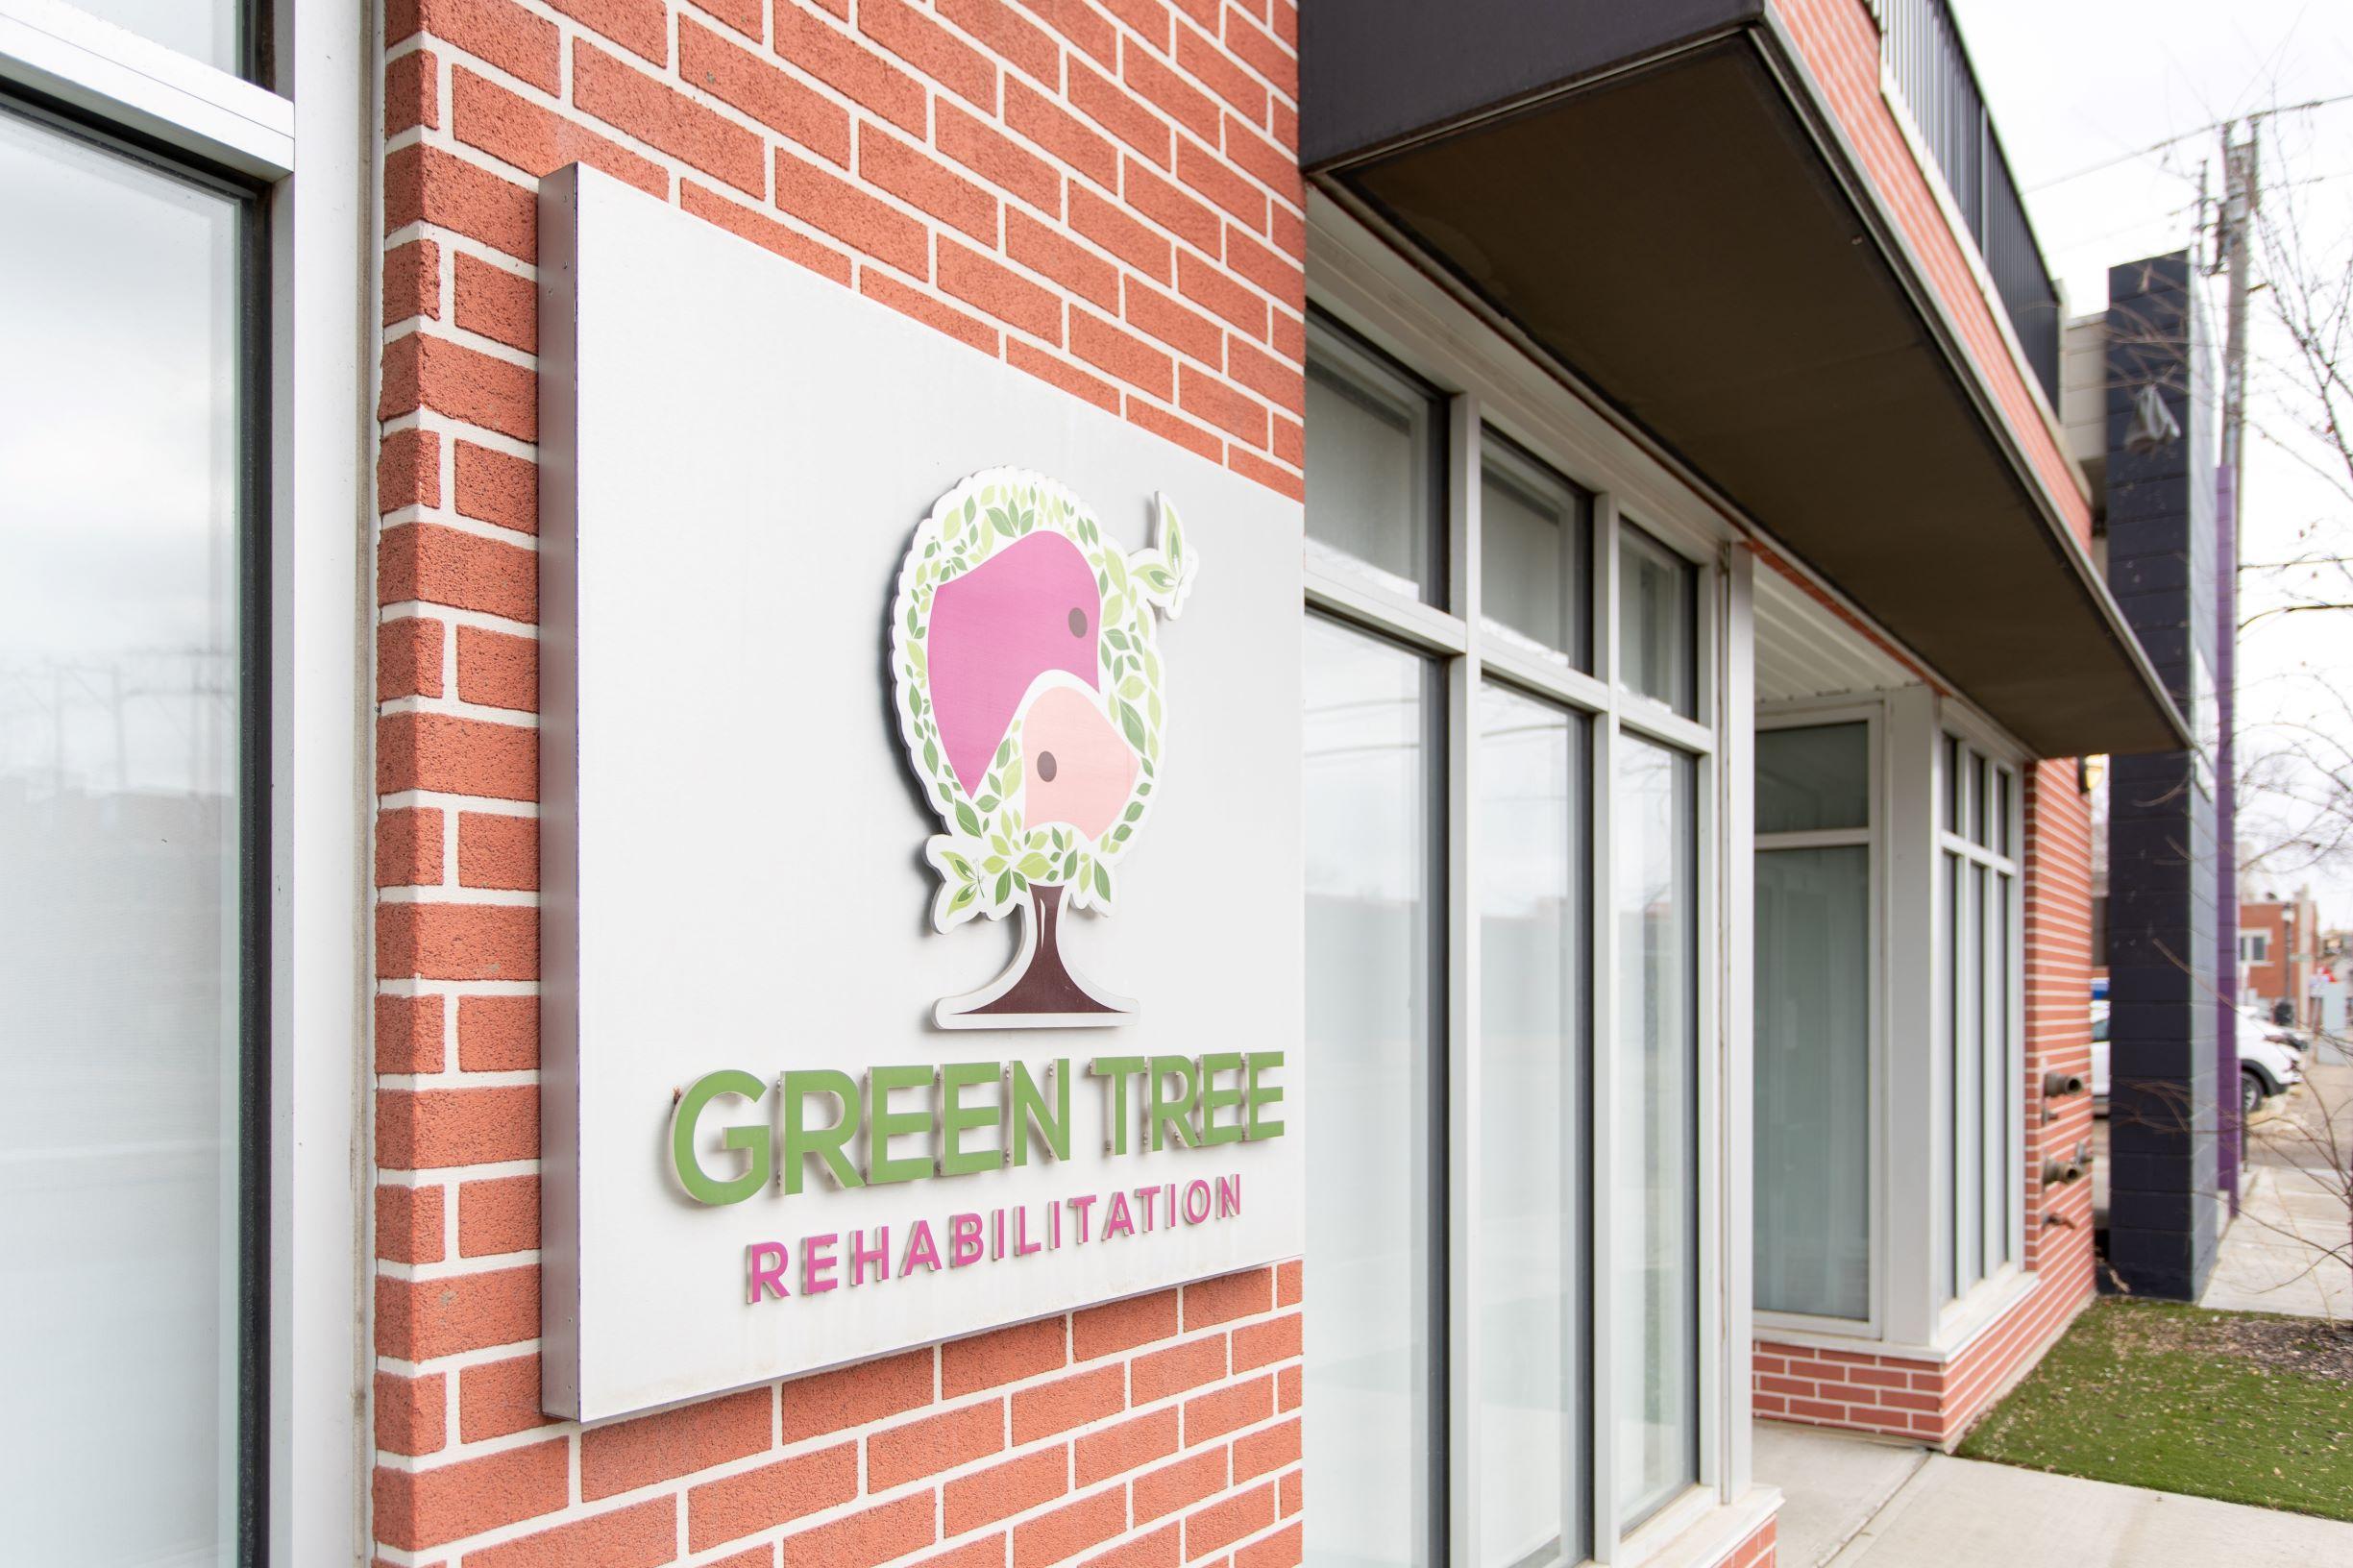 Greentree Rehabilitaiton signage